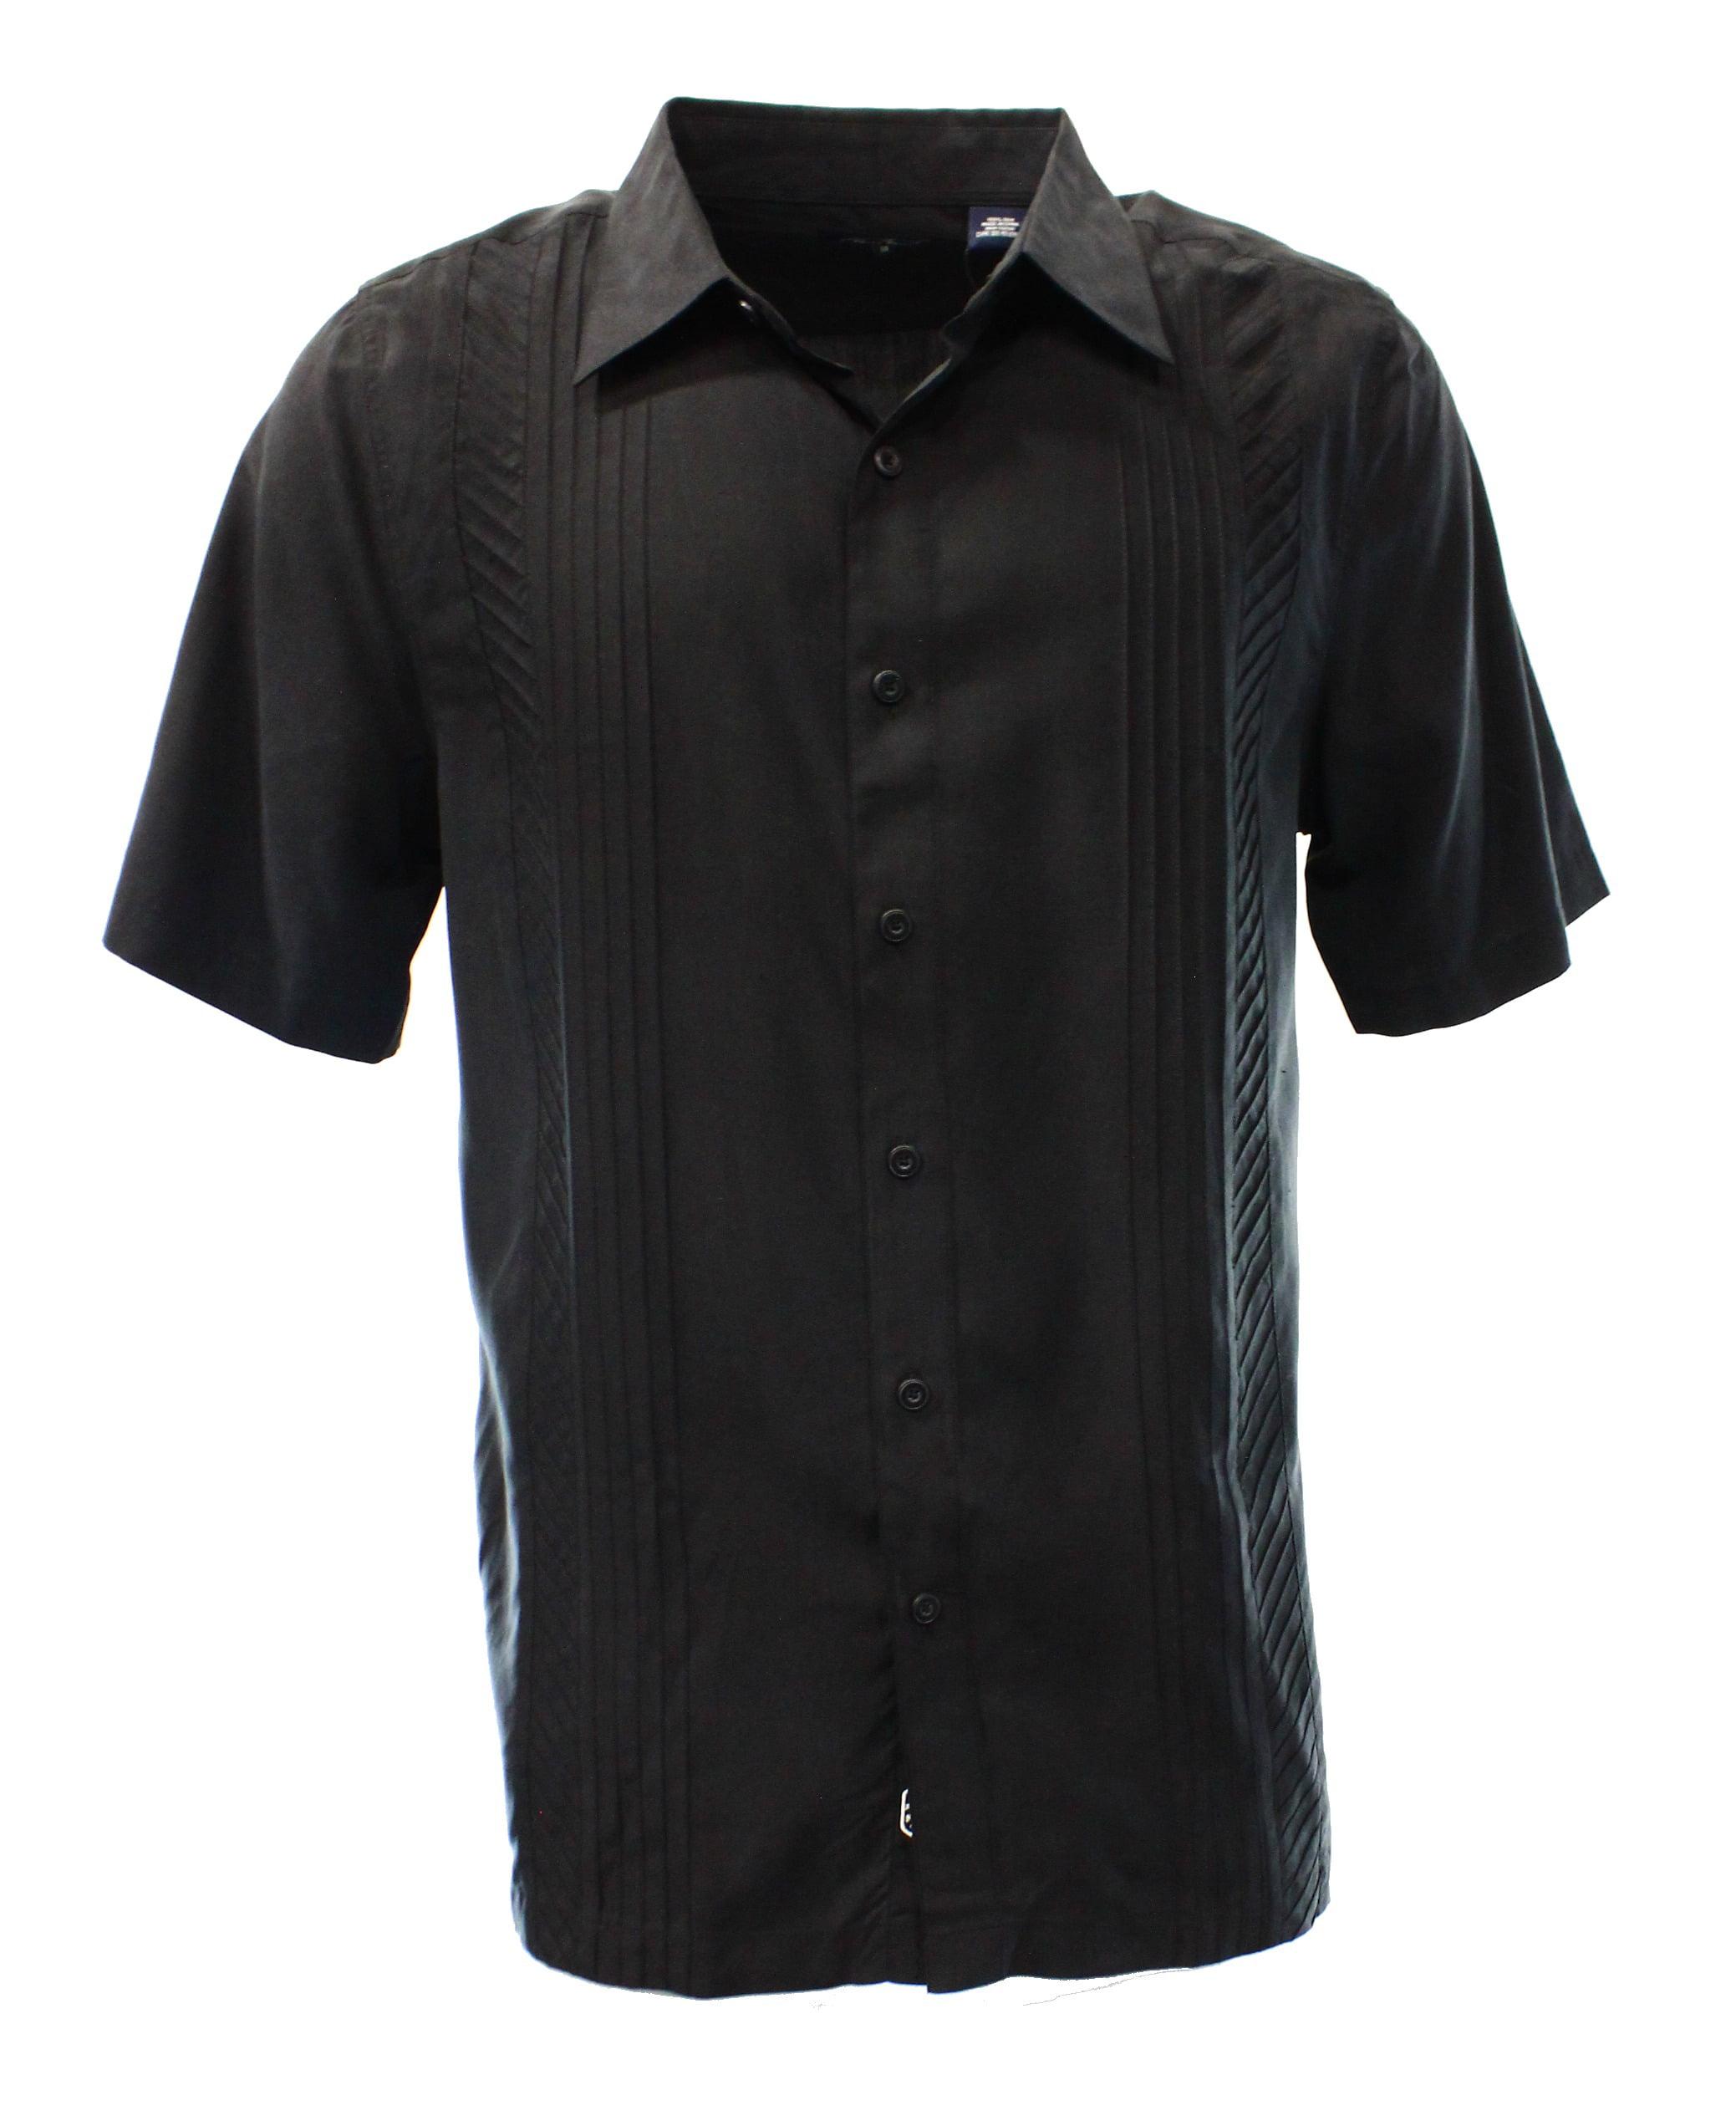 b92fab2ae2ac85 Nat Nast - Nat Nast NEW Black Mens Medium M Button-Front Silk Woven ...